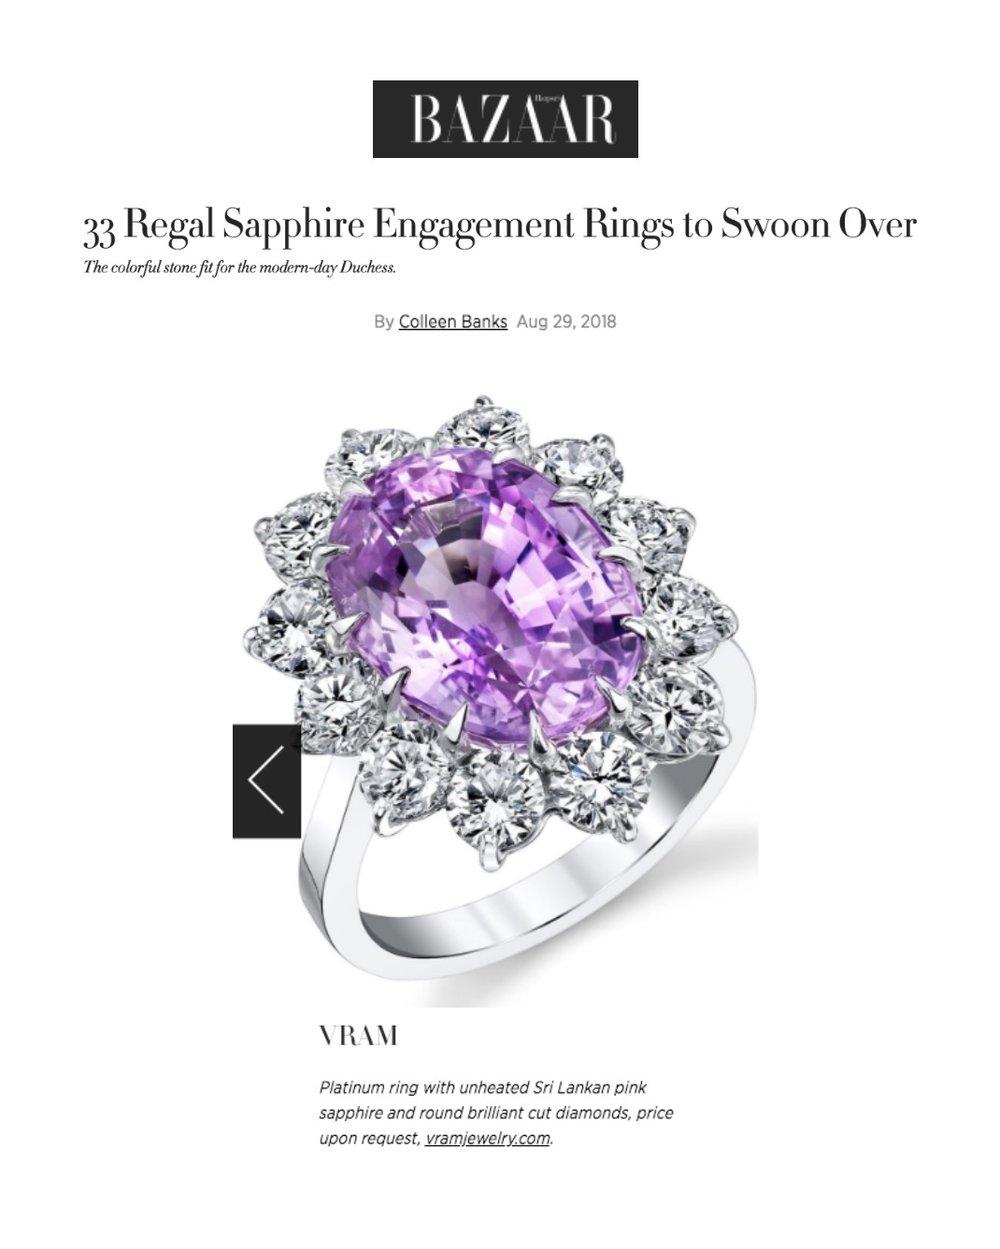 VRAM Jewelry Pink Sapphire Engagement Ring Harpers Bazaar